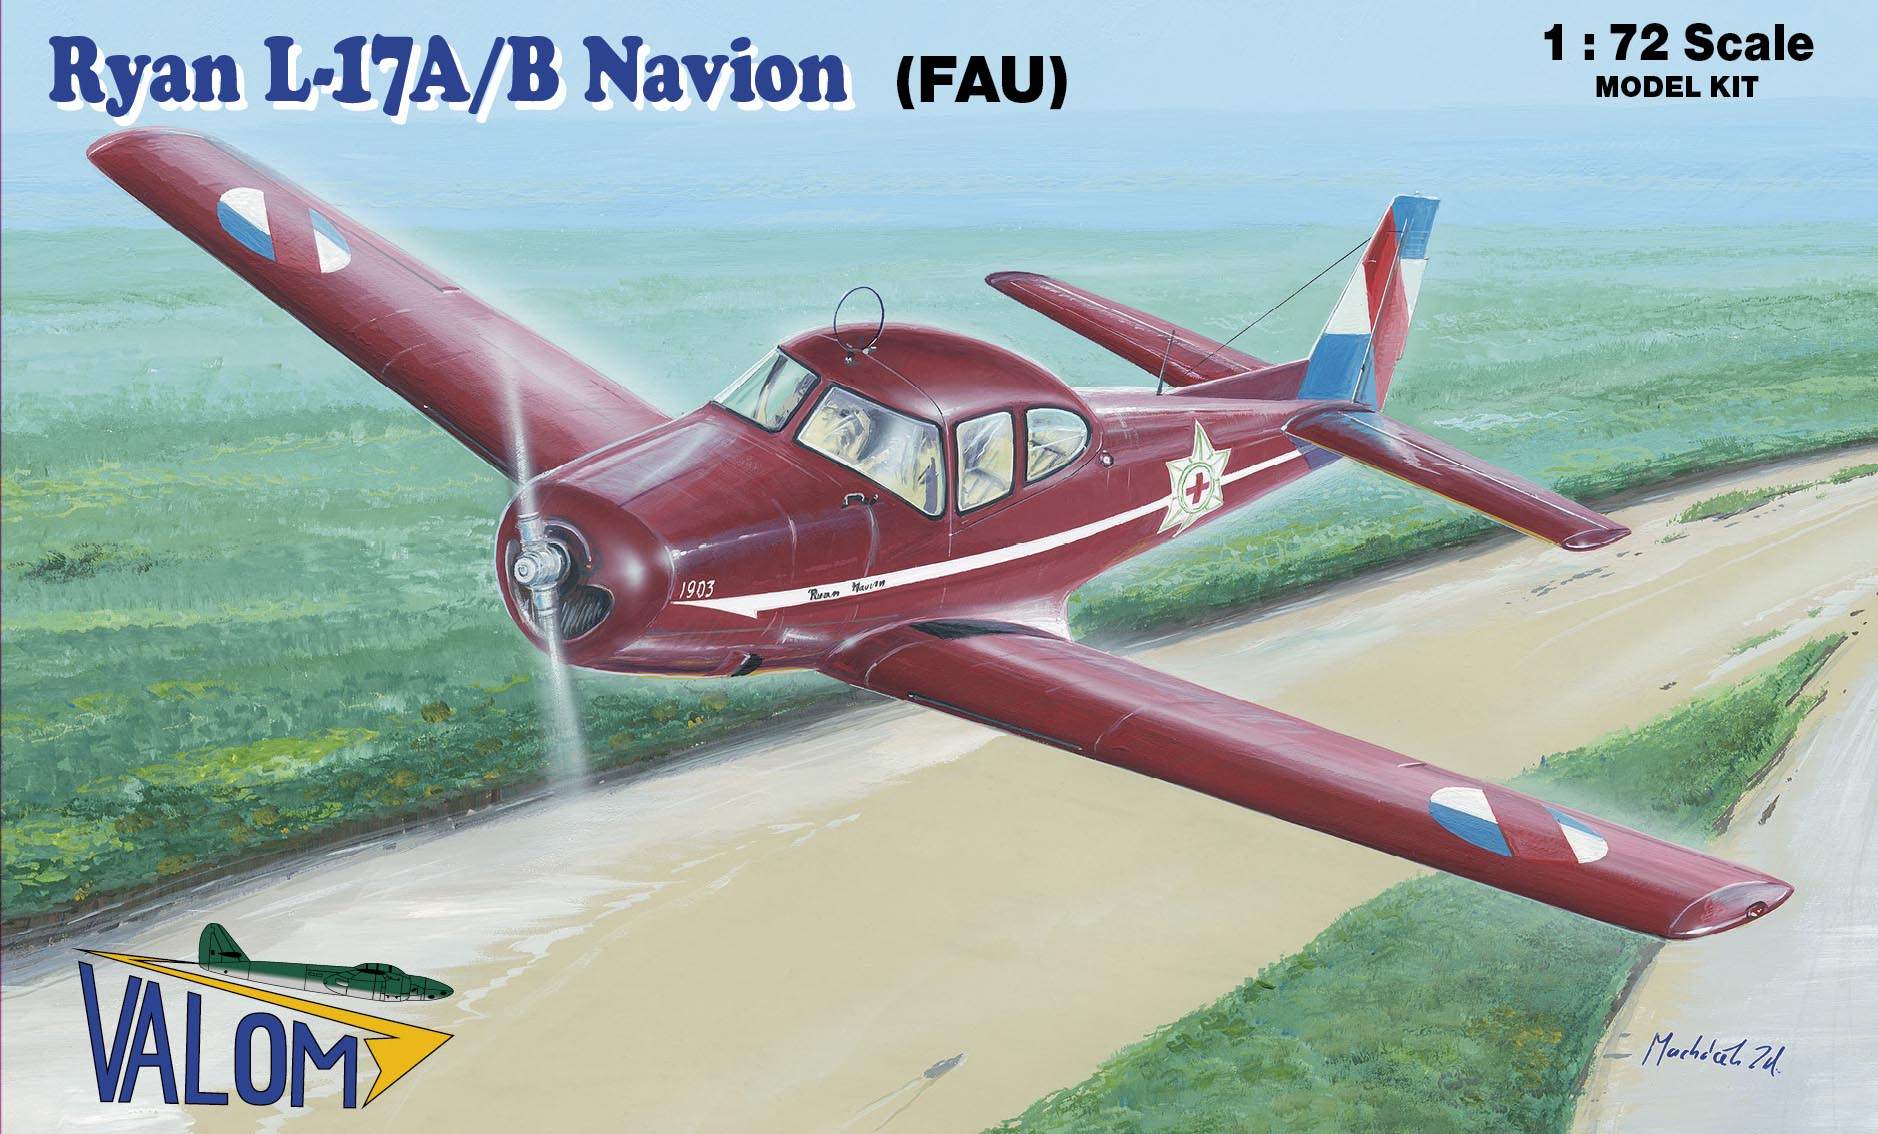 Valom Ryan L-17 A/B Navion (FAU)